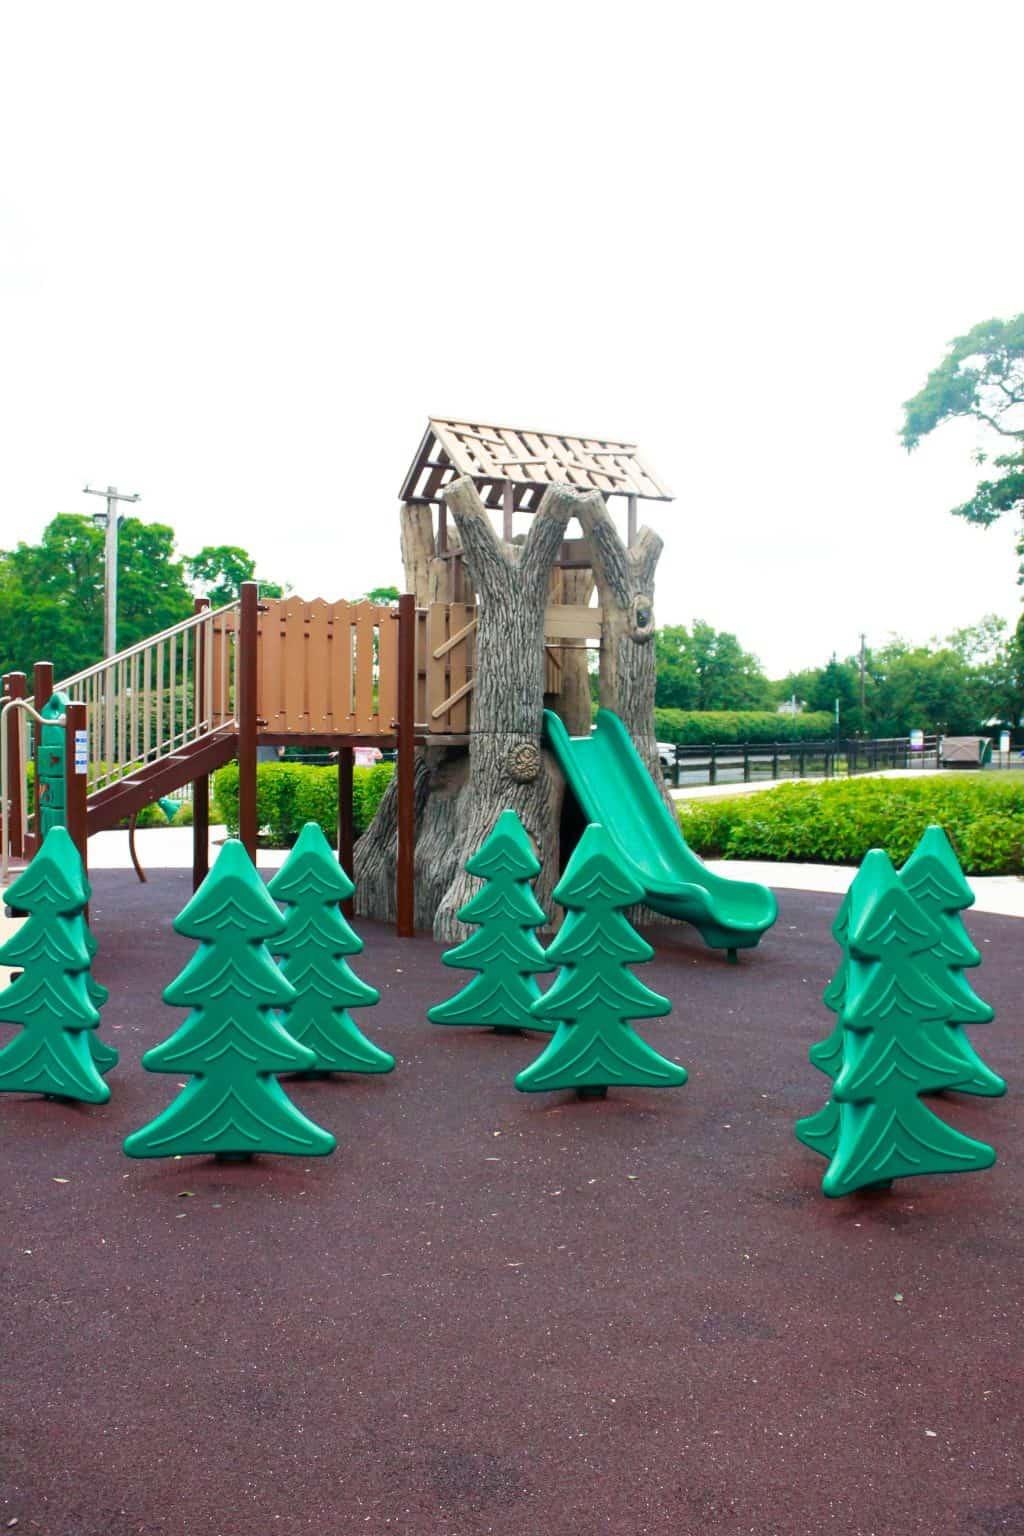 windward-beach-park-playground-brick-nj_27651422453_o-1024x1536